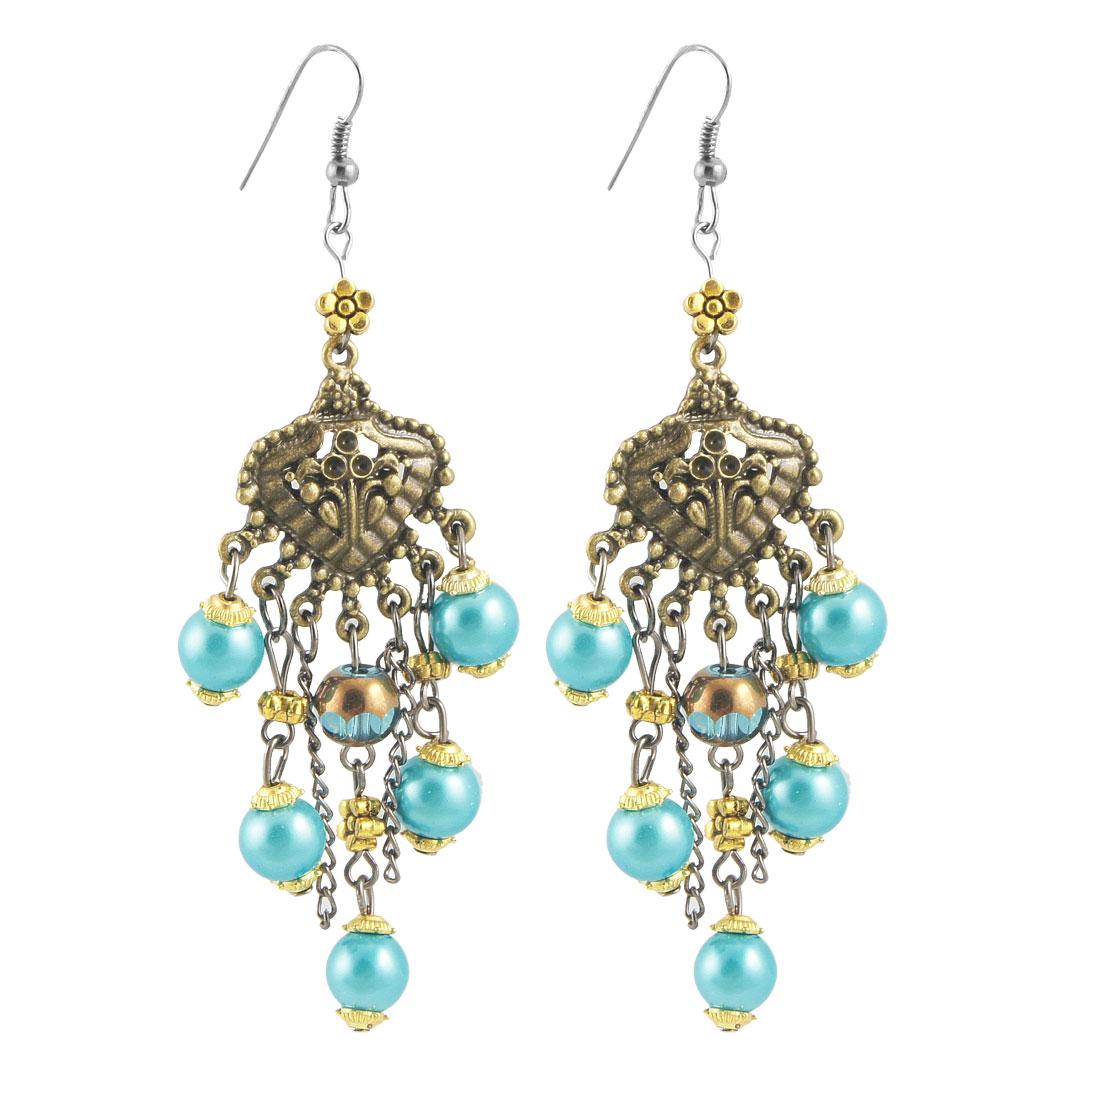 Bronze Tone Leaf Shape Decor Teal Blue Beads Pendants Hook Earrings